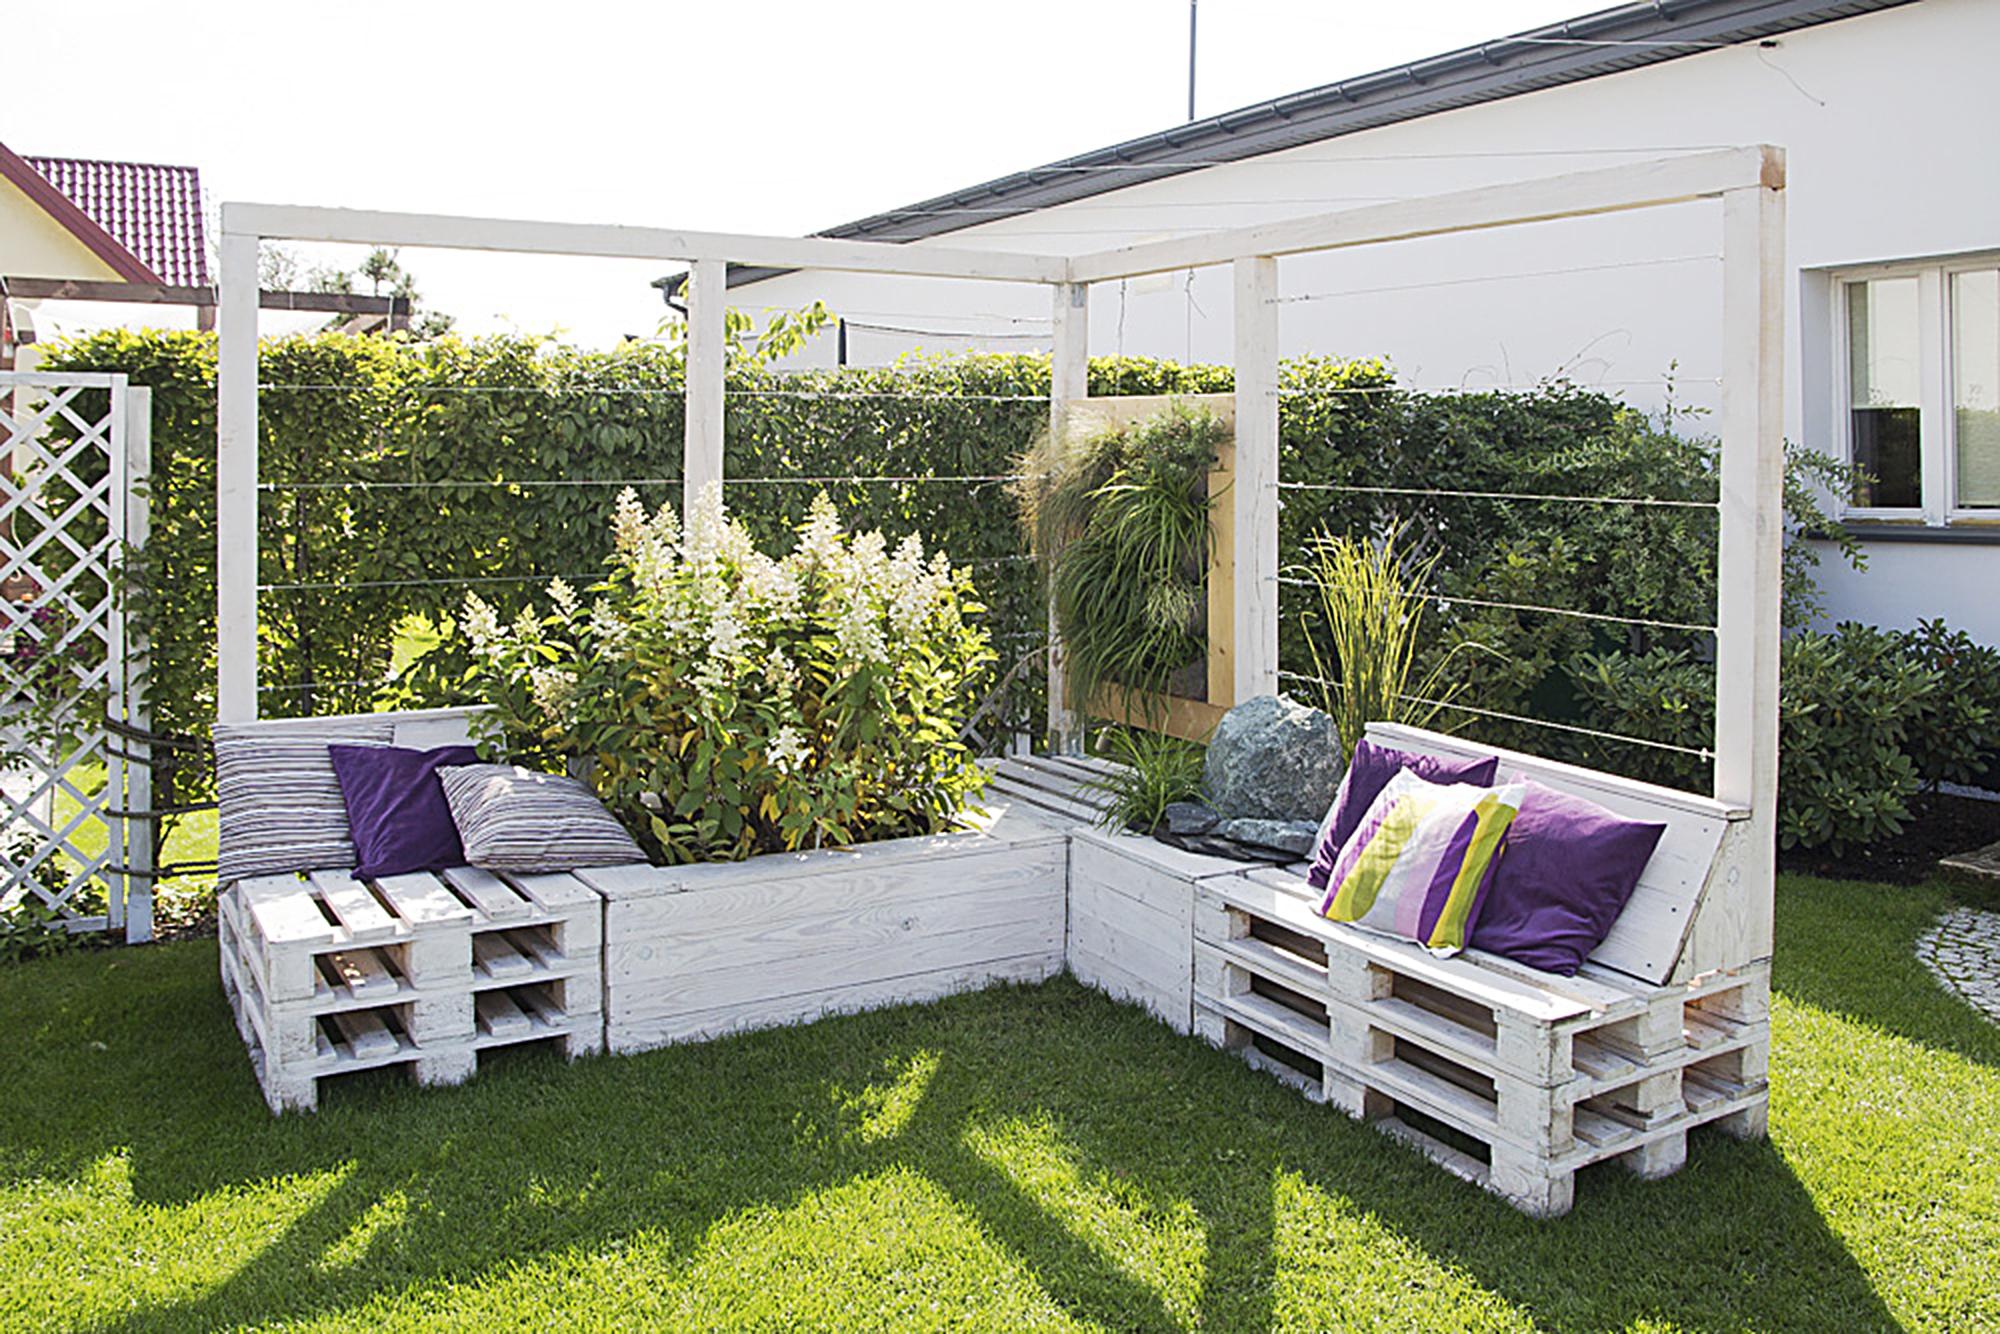 meble ogrodowe z palet 5 stylowych pomys w claudia. Black Bedroom Furniture Sets. Home Design Ideas